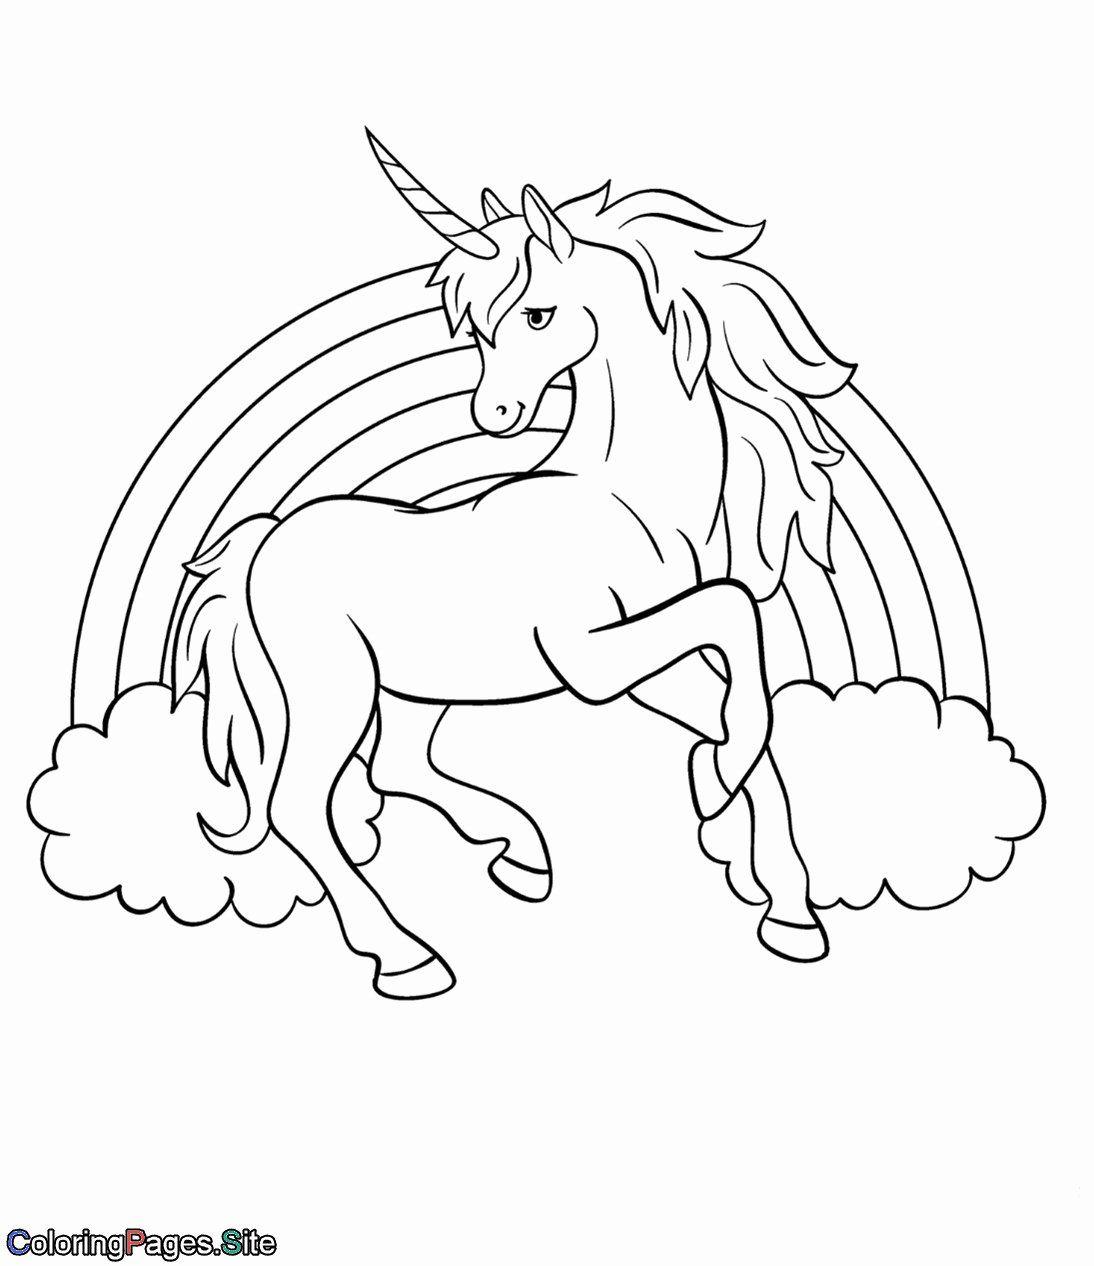 Pin By Monika Luczak On Coloring In 2020 Unicorn Coloring Pages Unicorn Pictures To Color Unicorn Pictures